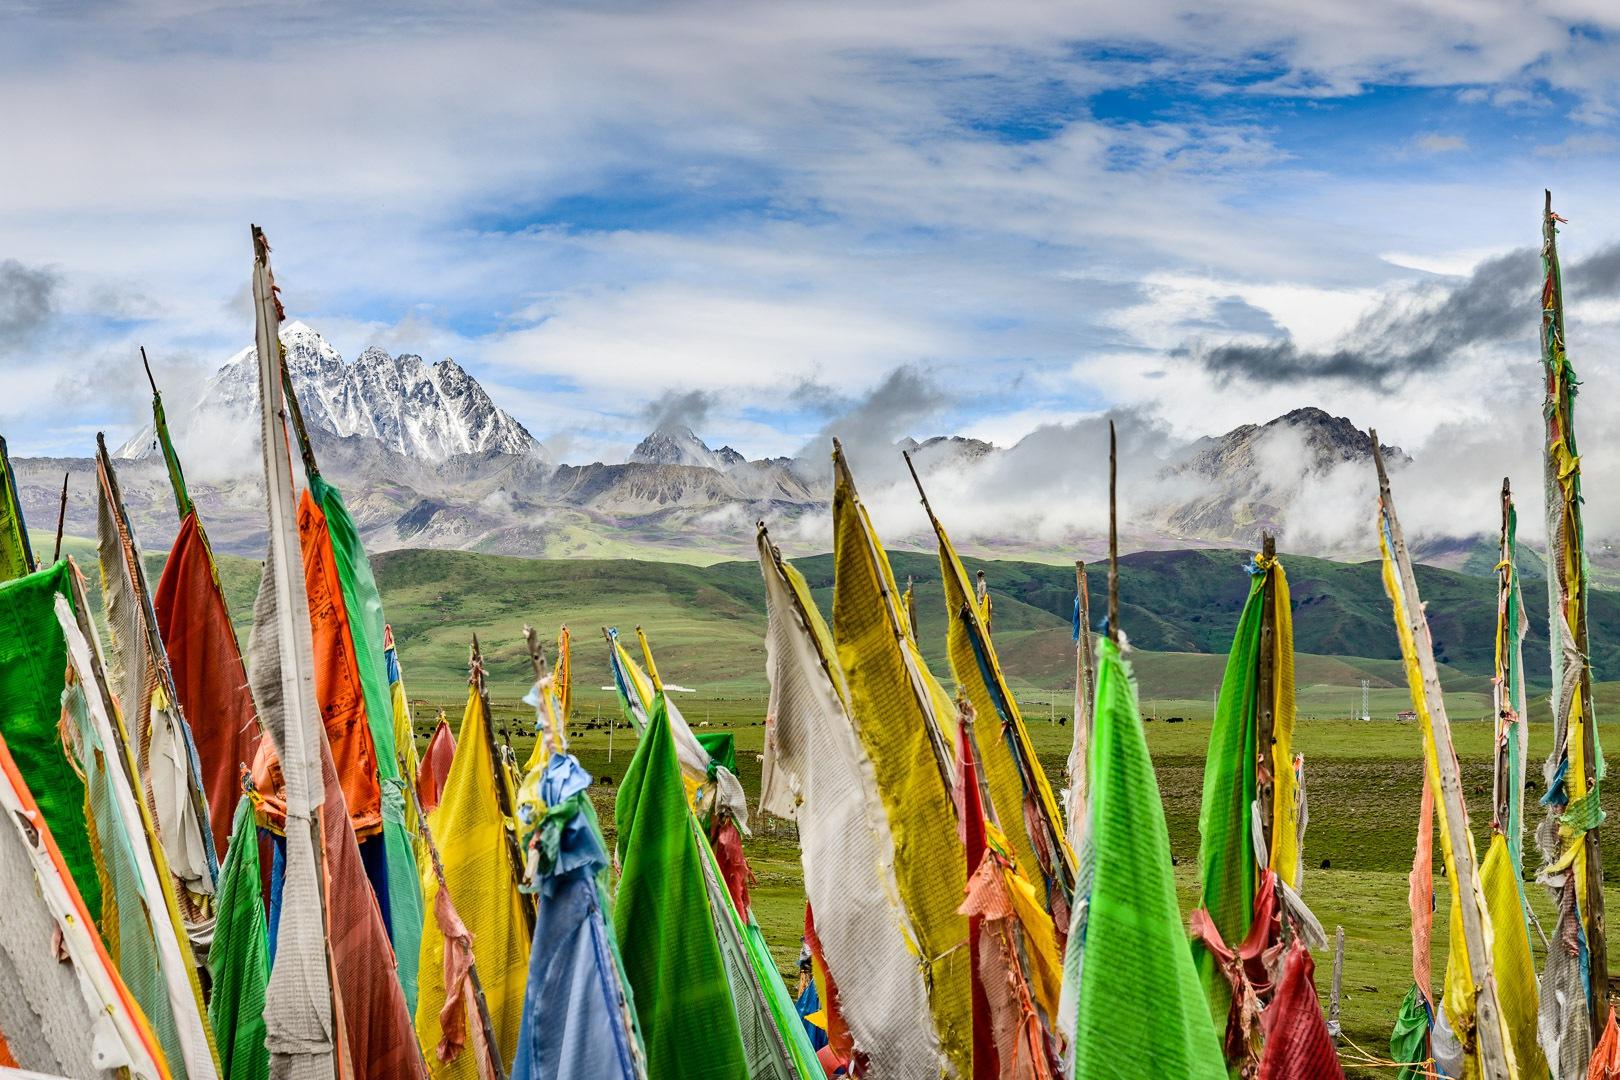 Tagong, prayer flags and grasslands